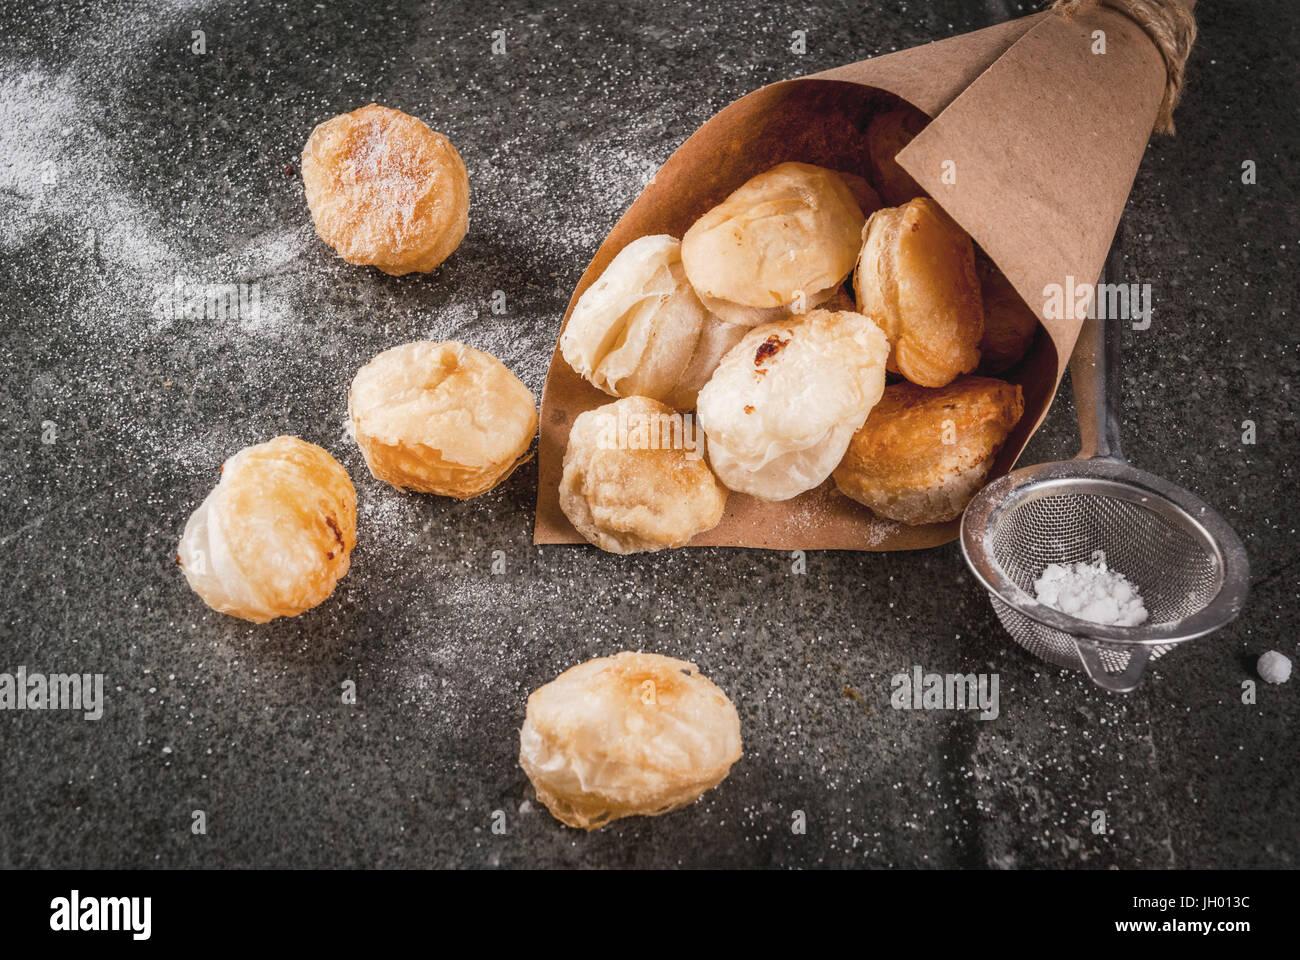 Hausgemachte backen, Blätterteiggebäck. Trendige Lebensmittel. Cronuts Popcorn, Blätterteig Krapfen Stockbild